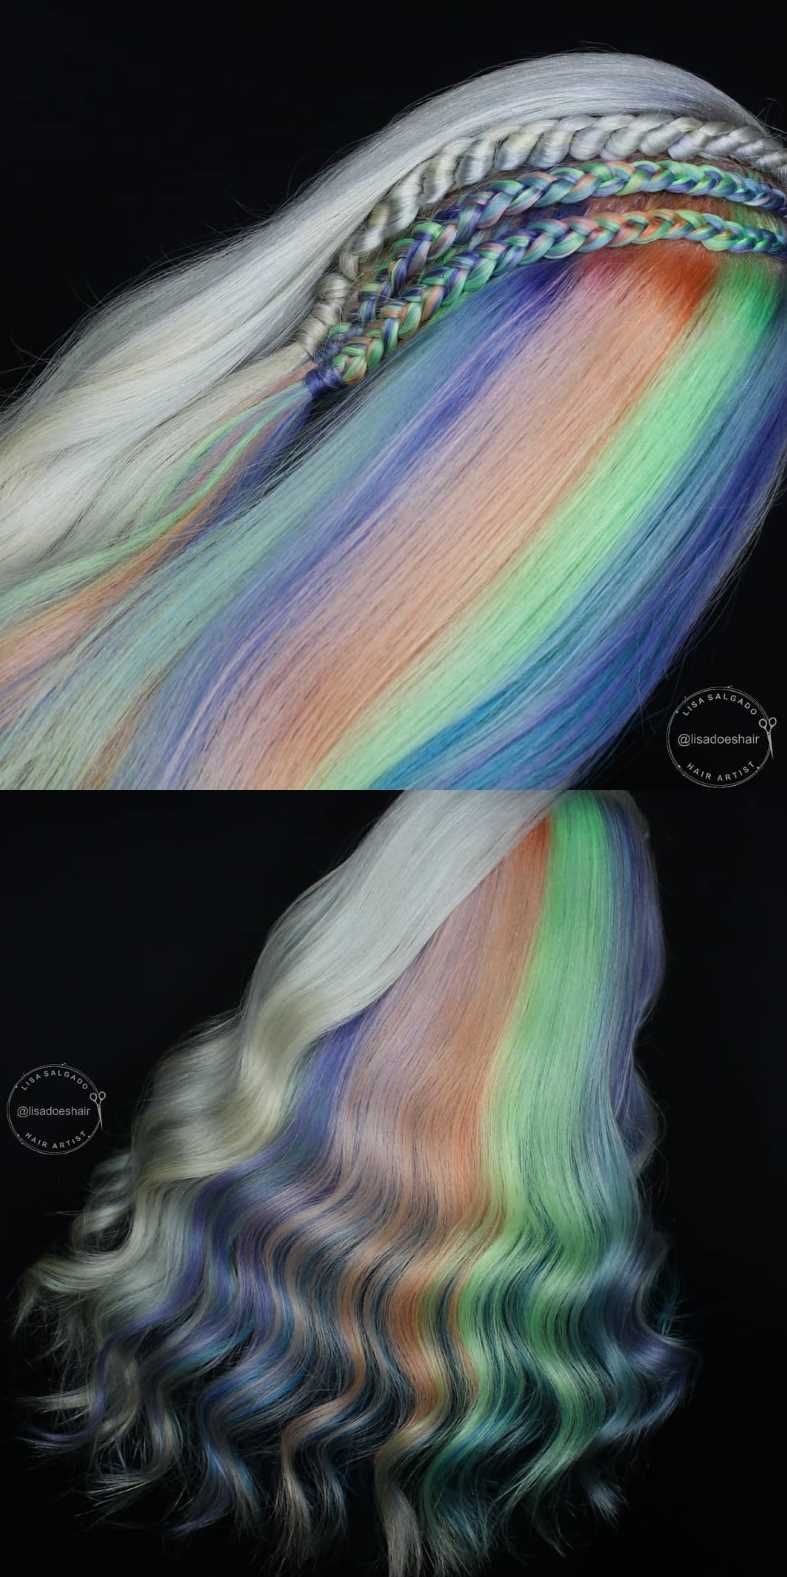 Top Pravana Pastels Hair Color Trends For 2018 Pravana Pastels